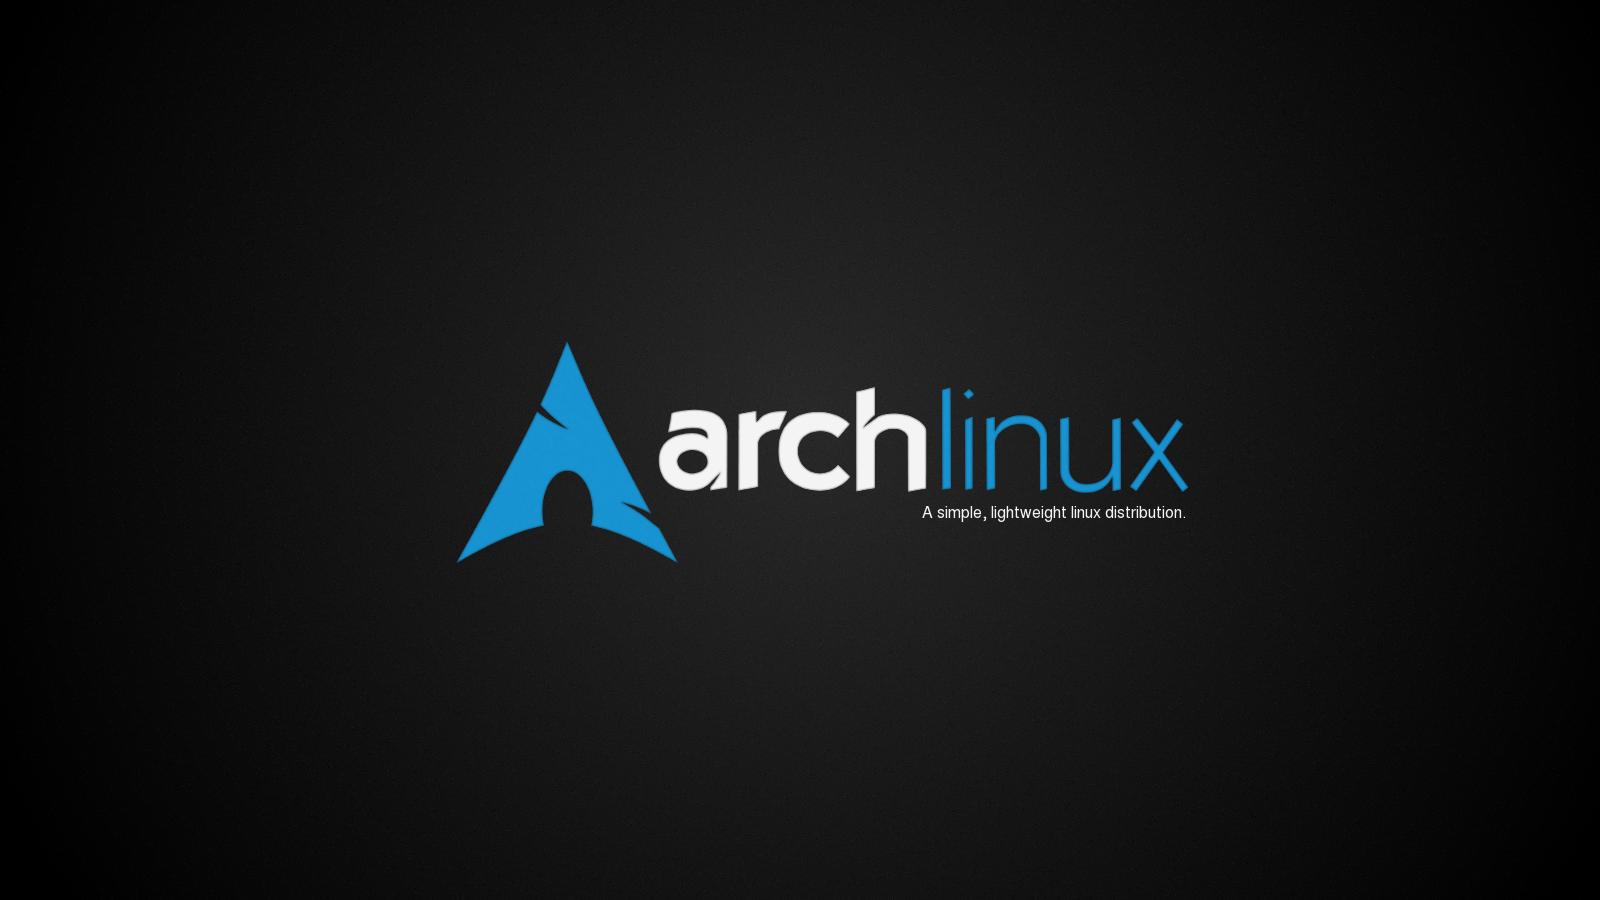 arch linux wallpaper black - photo #13